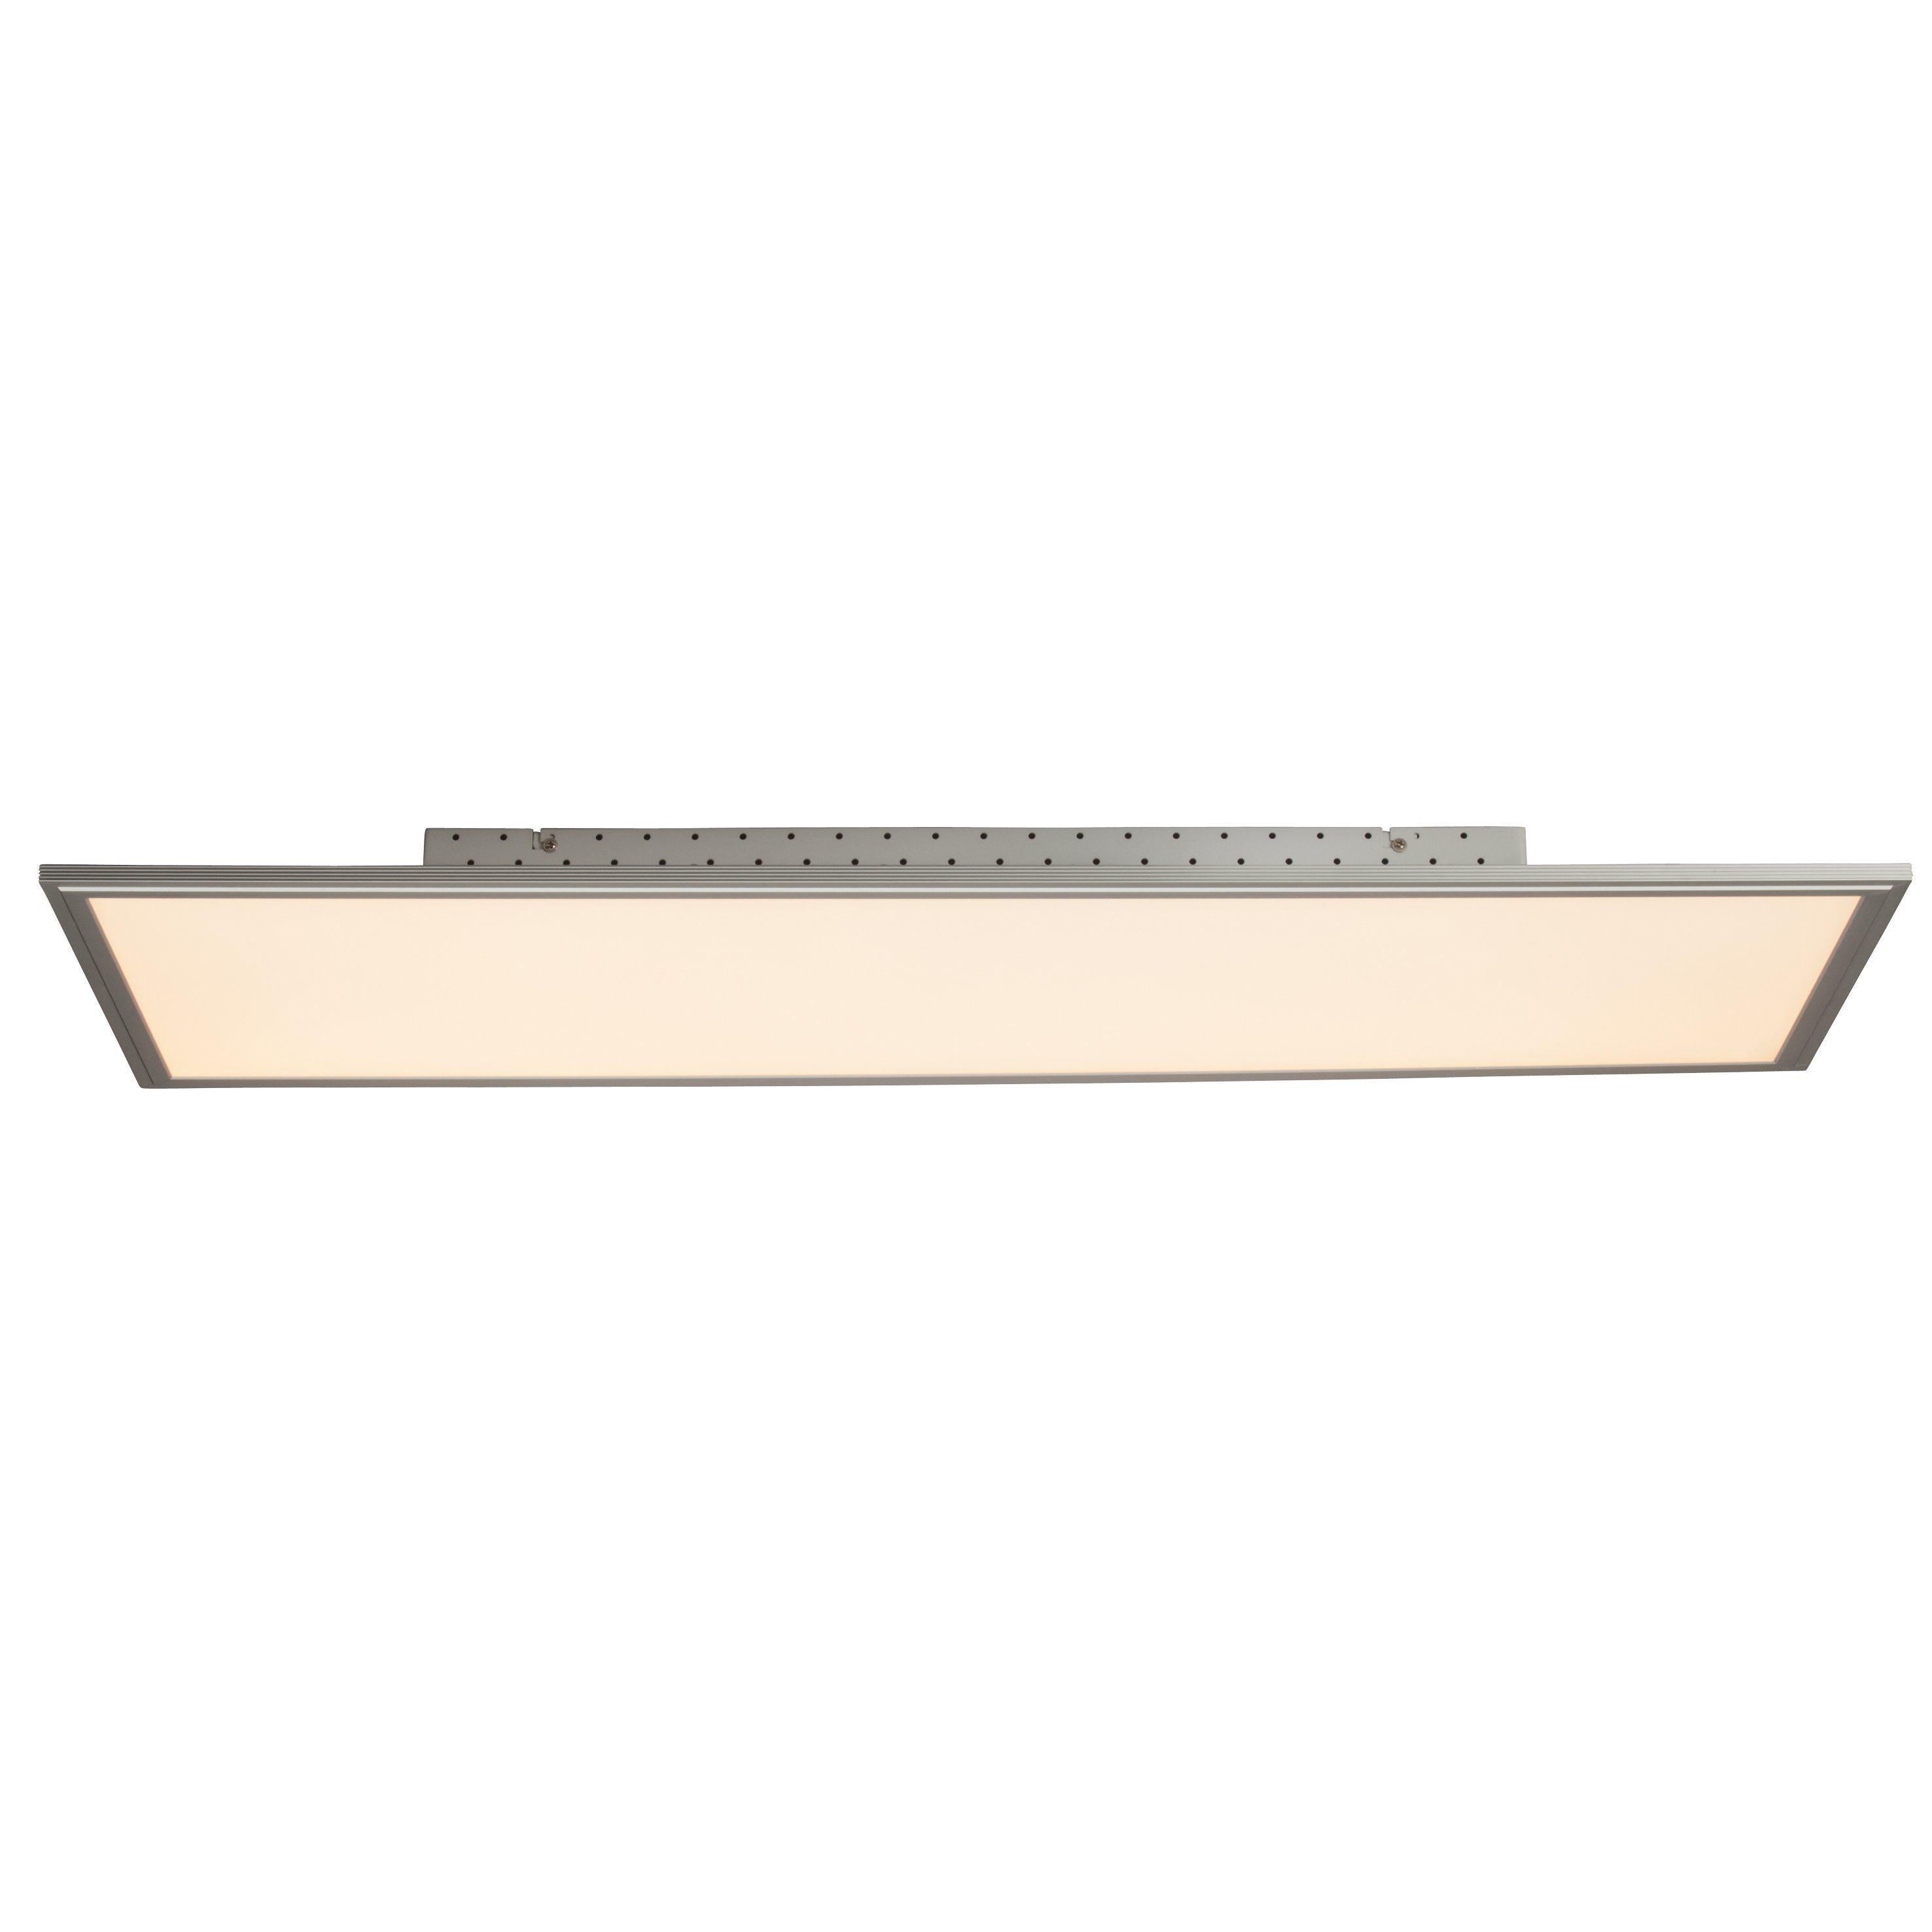 Brilliant Leuchten Flat LED Deckenaufbau-Paneel 100x35cm alu/weiß Fernbedienung